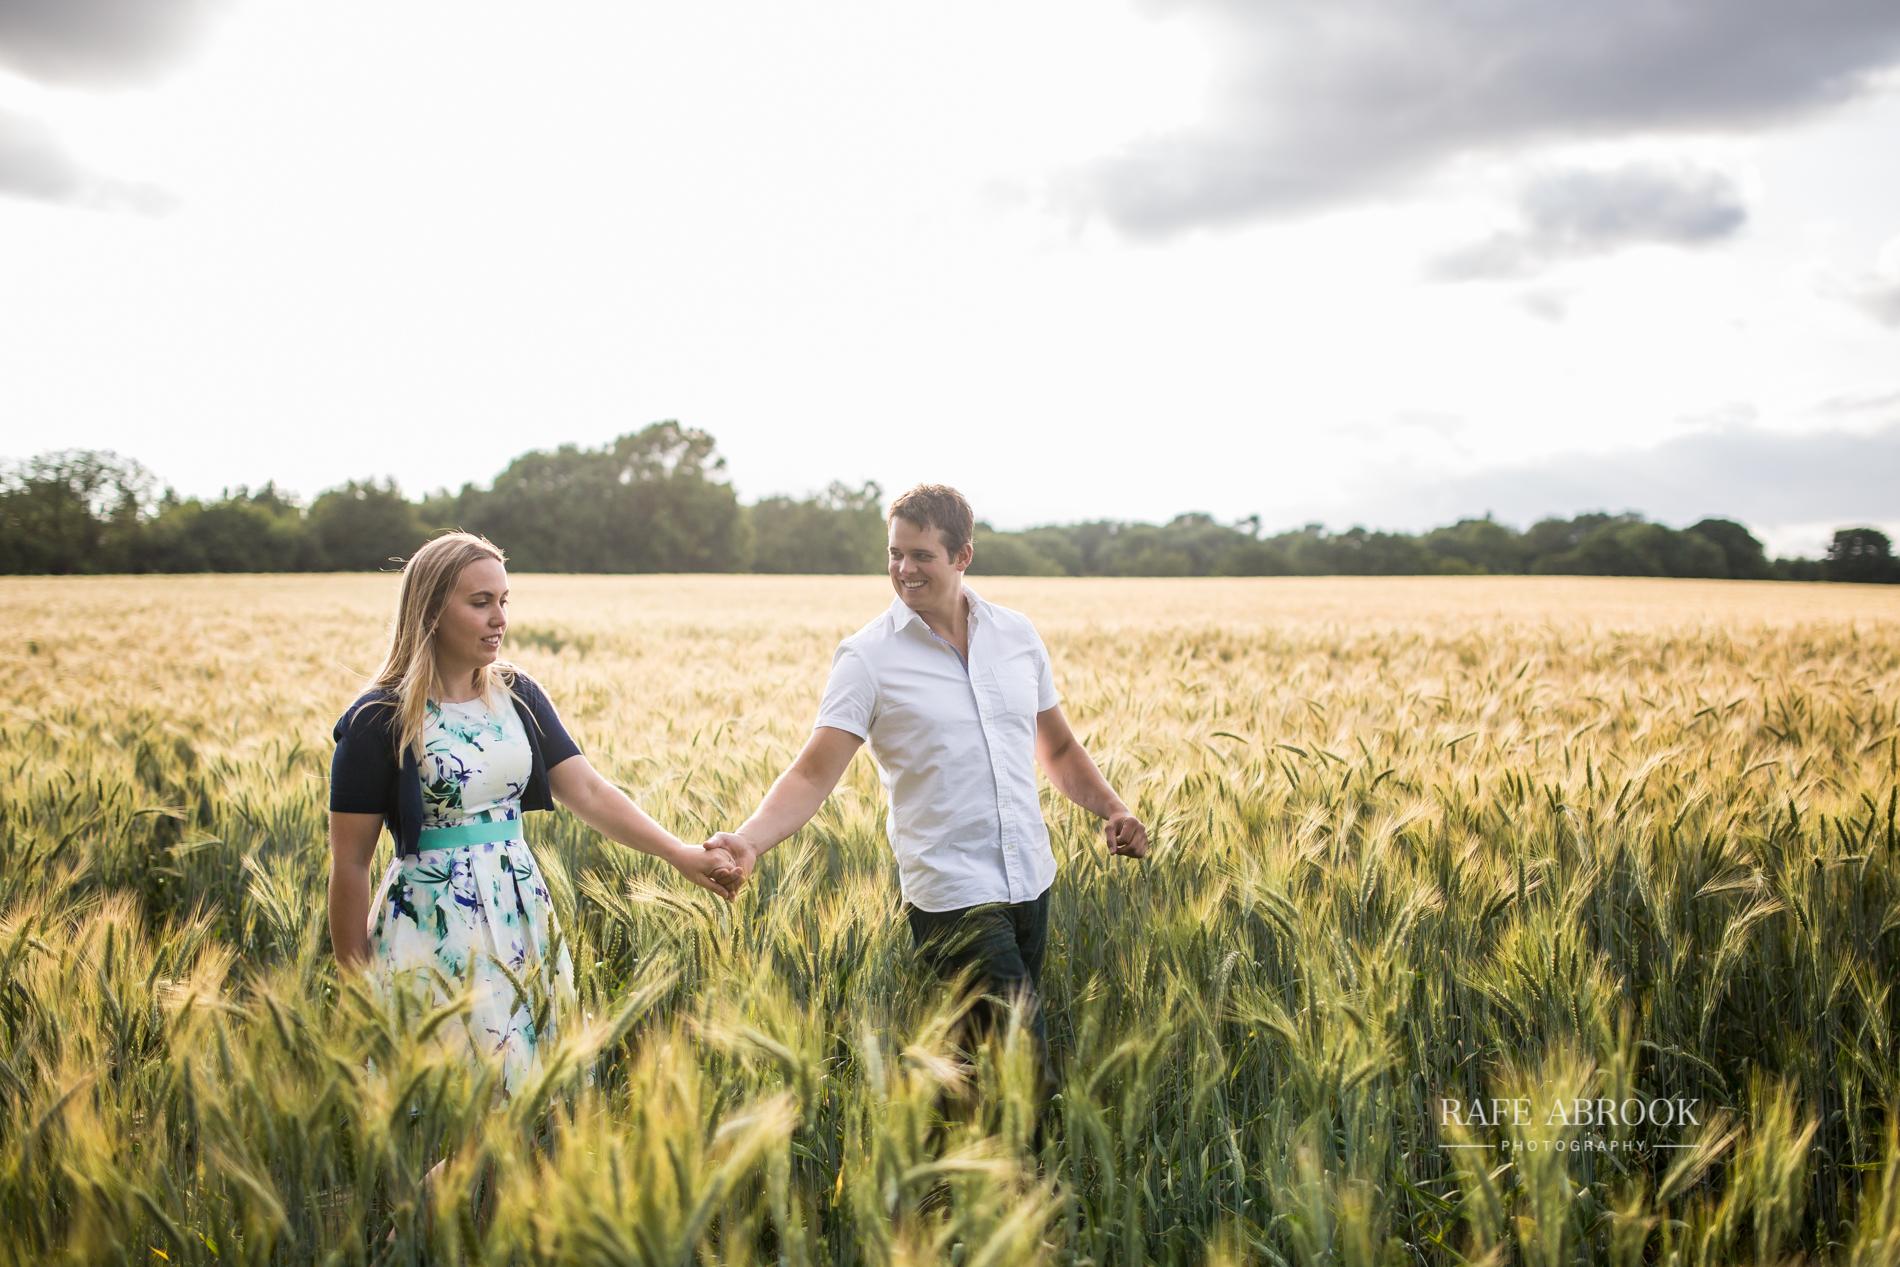 melanie & graham engagement shoot great ashby district park stevenage hertfordshire-1014.jpg